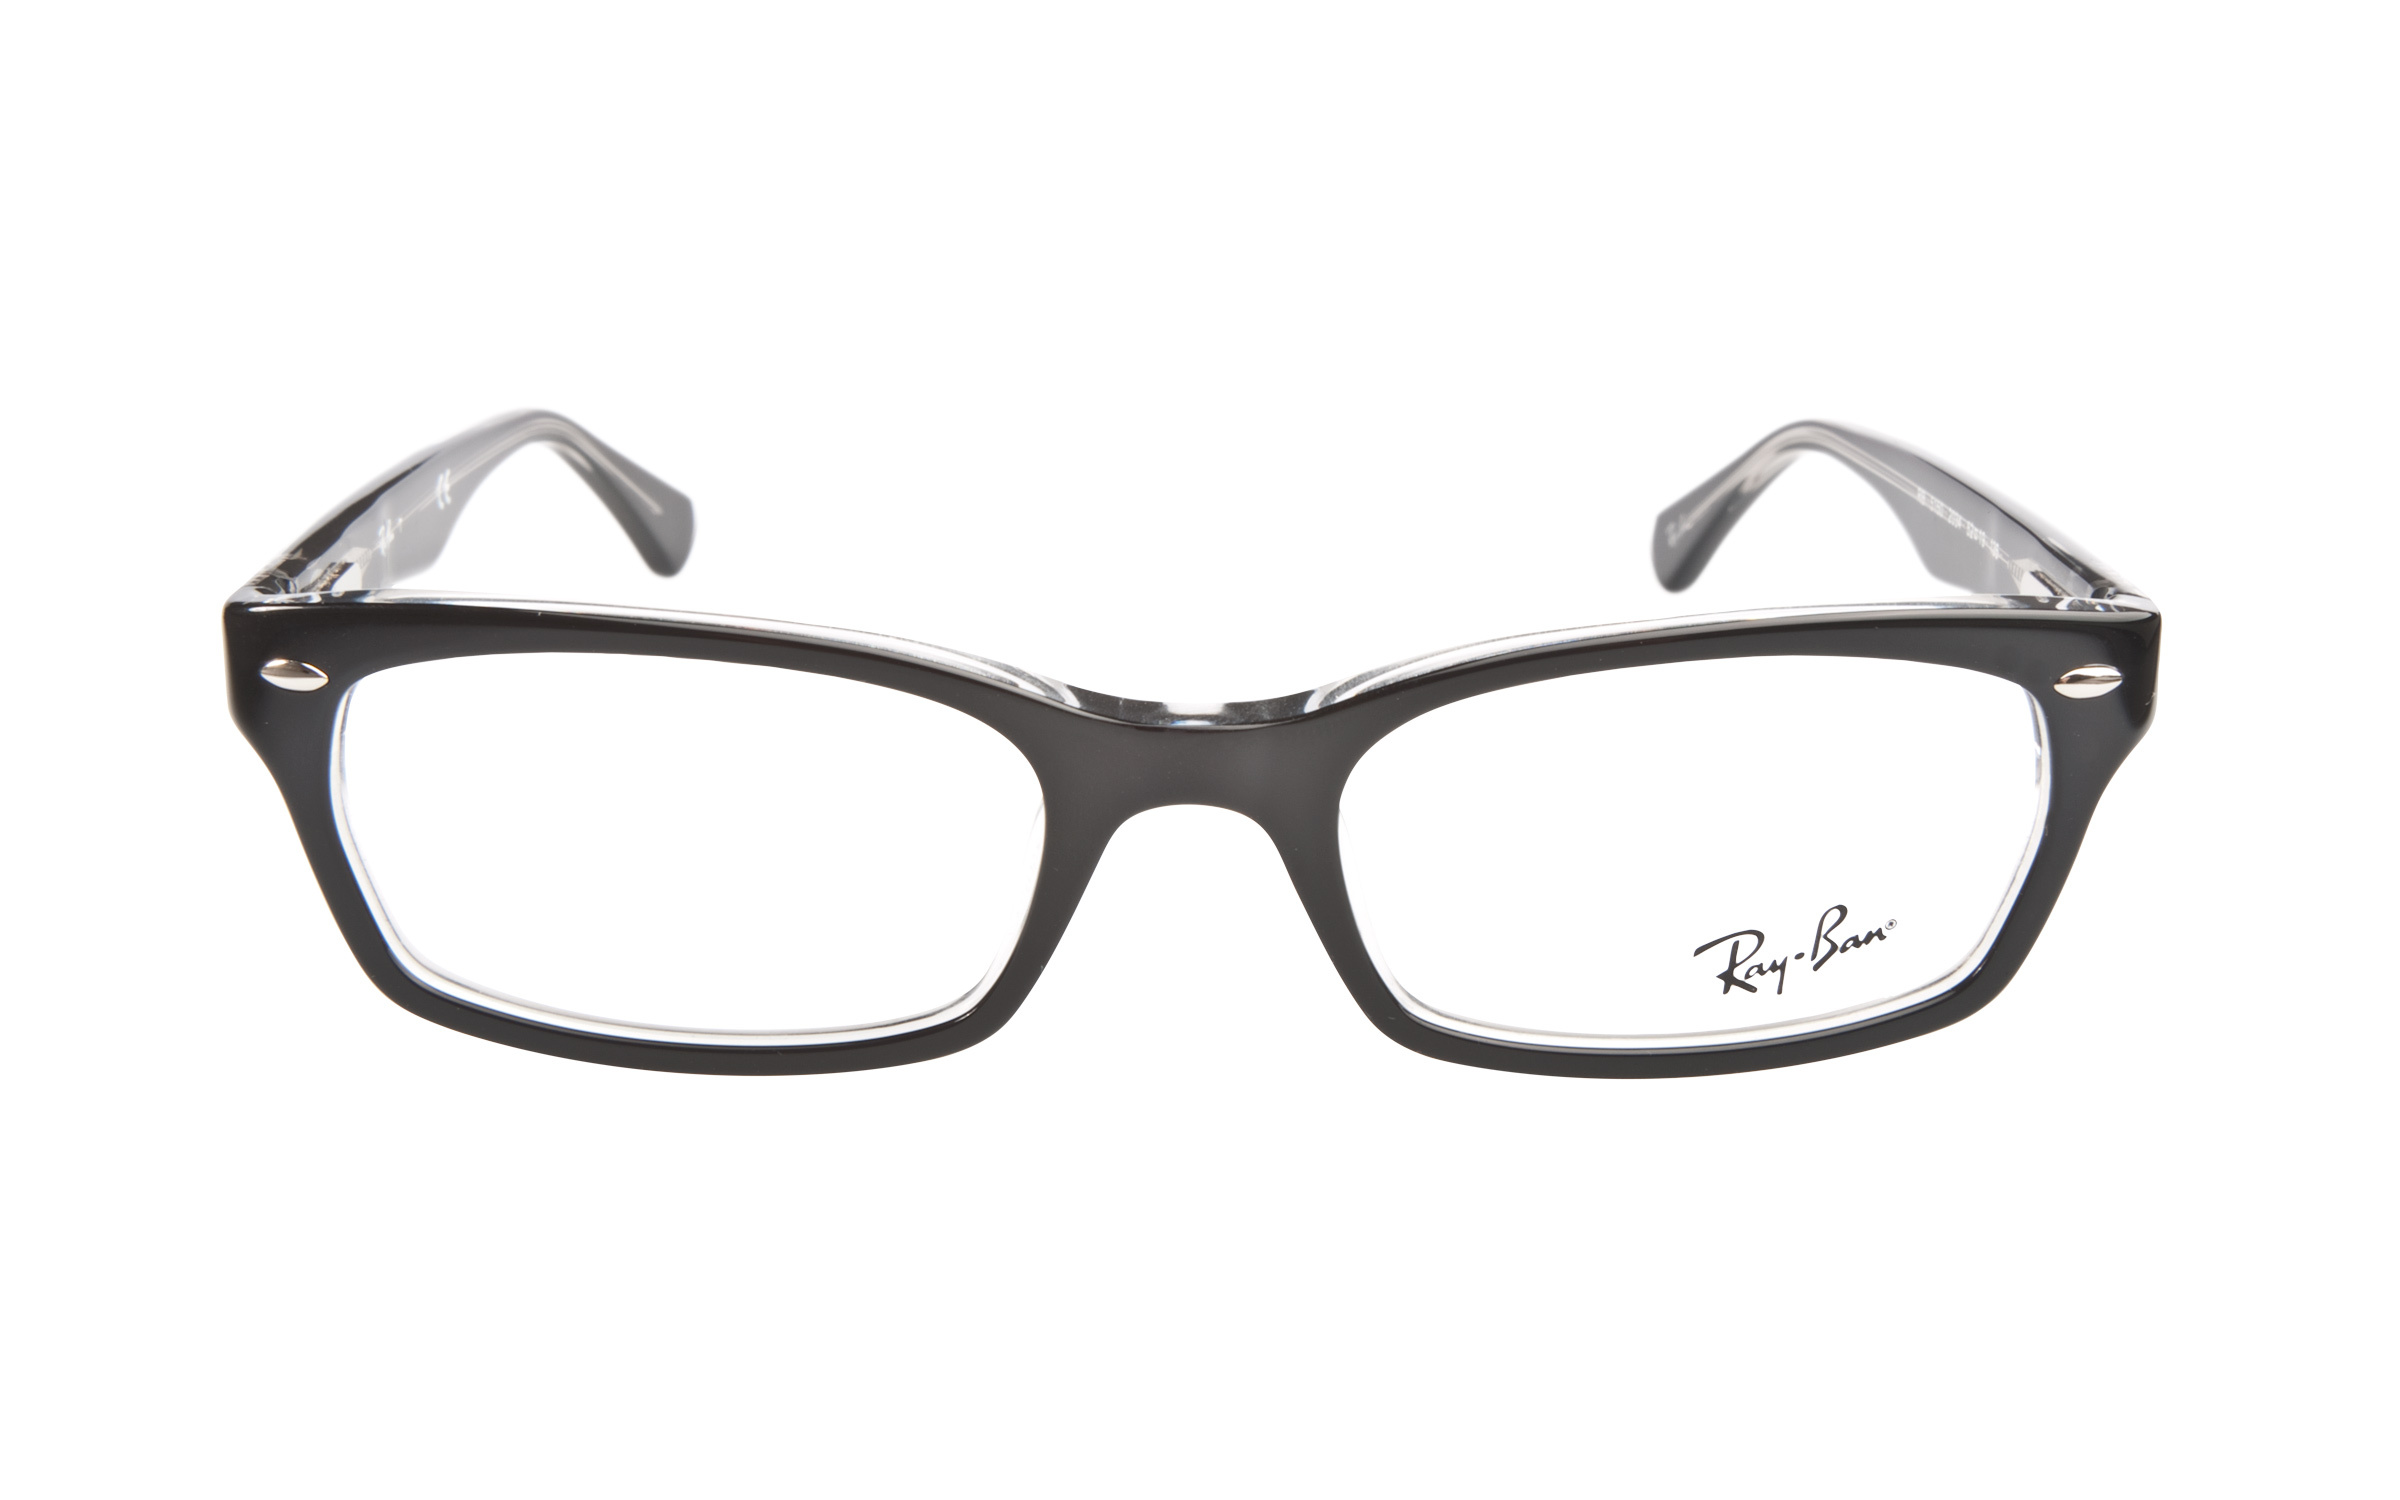 RayBan_Glasses_Classic_Black_Acetate_Online_Coastal